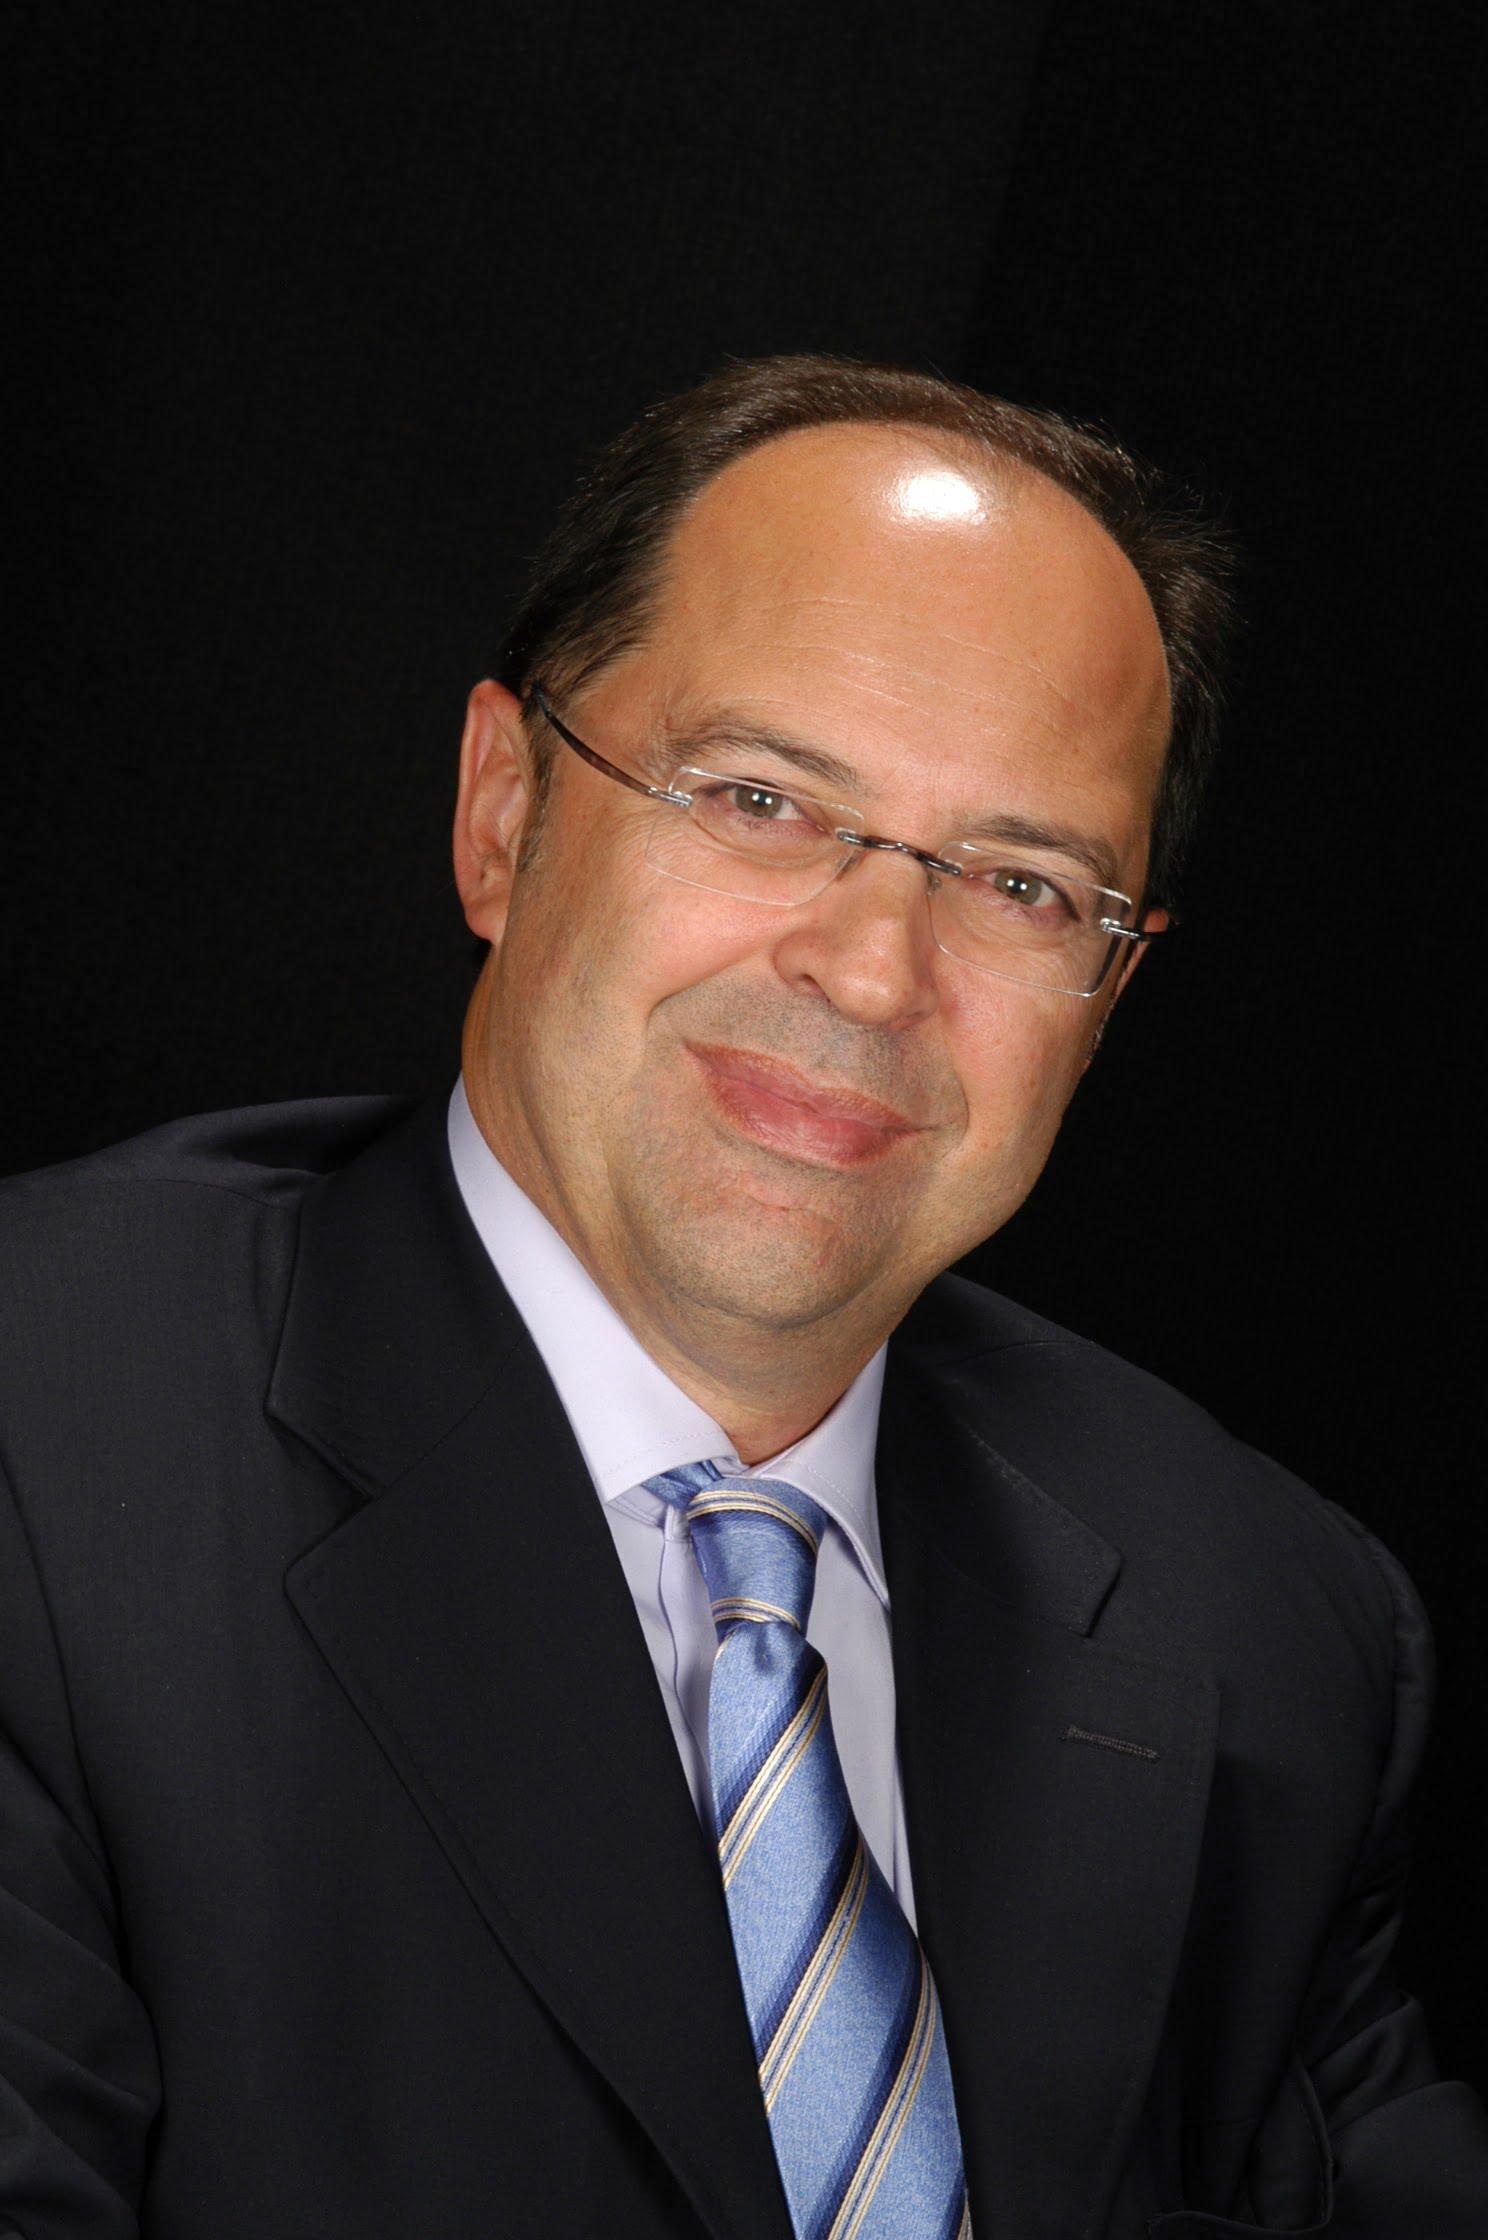 Sr. Jaume Aldabó i Sans